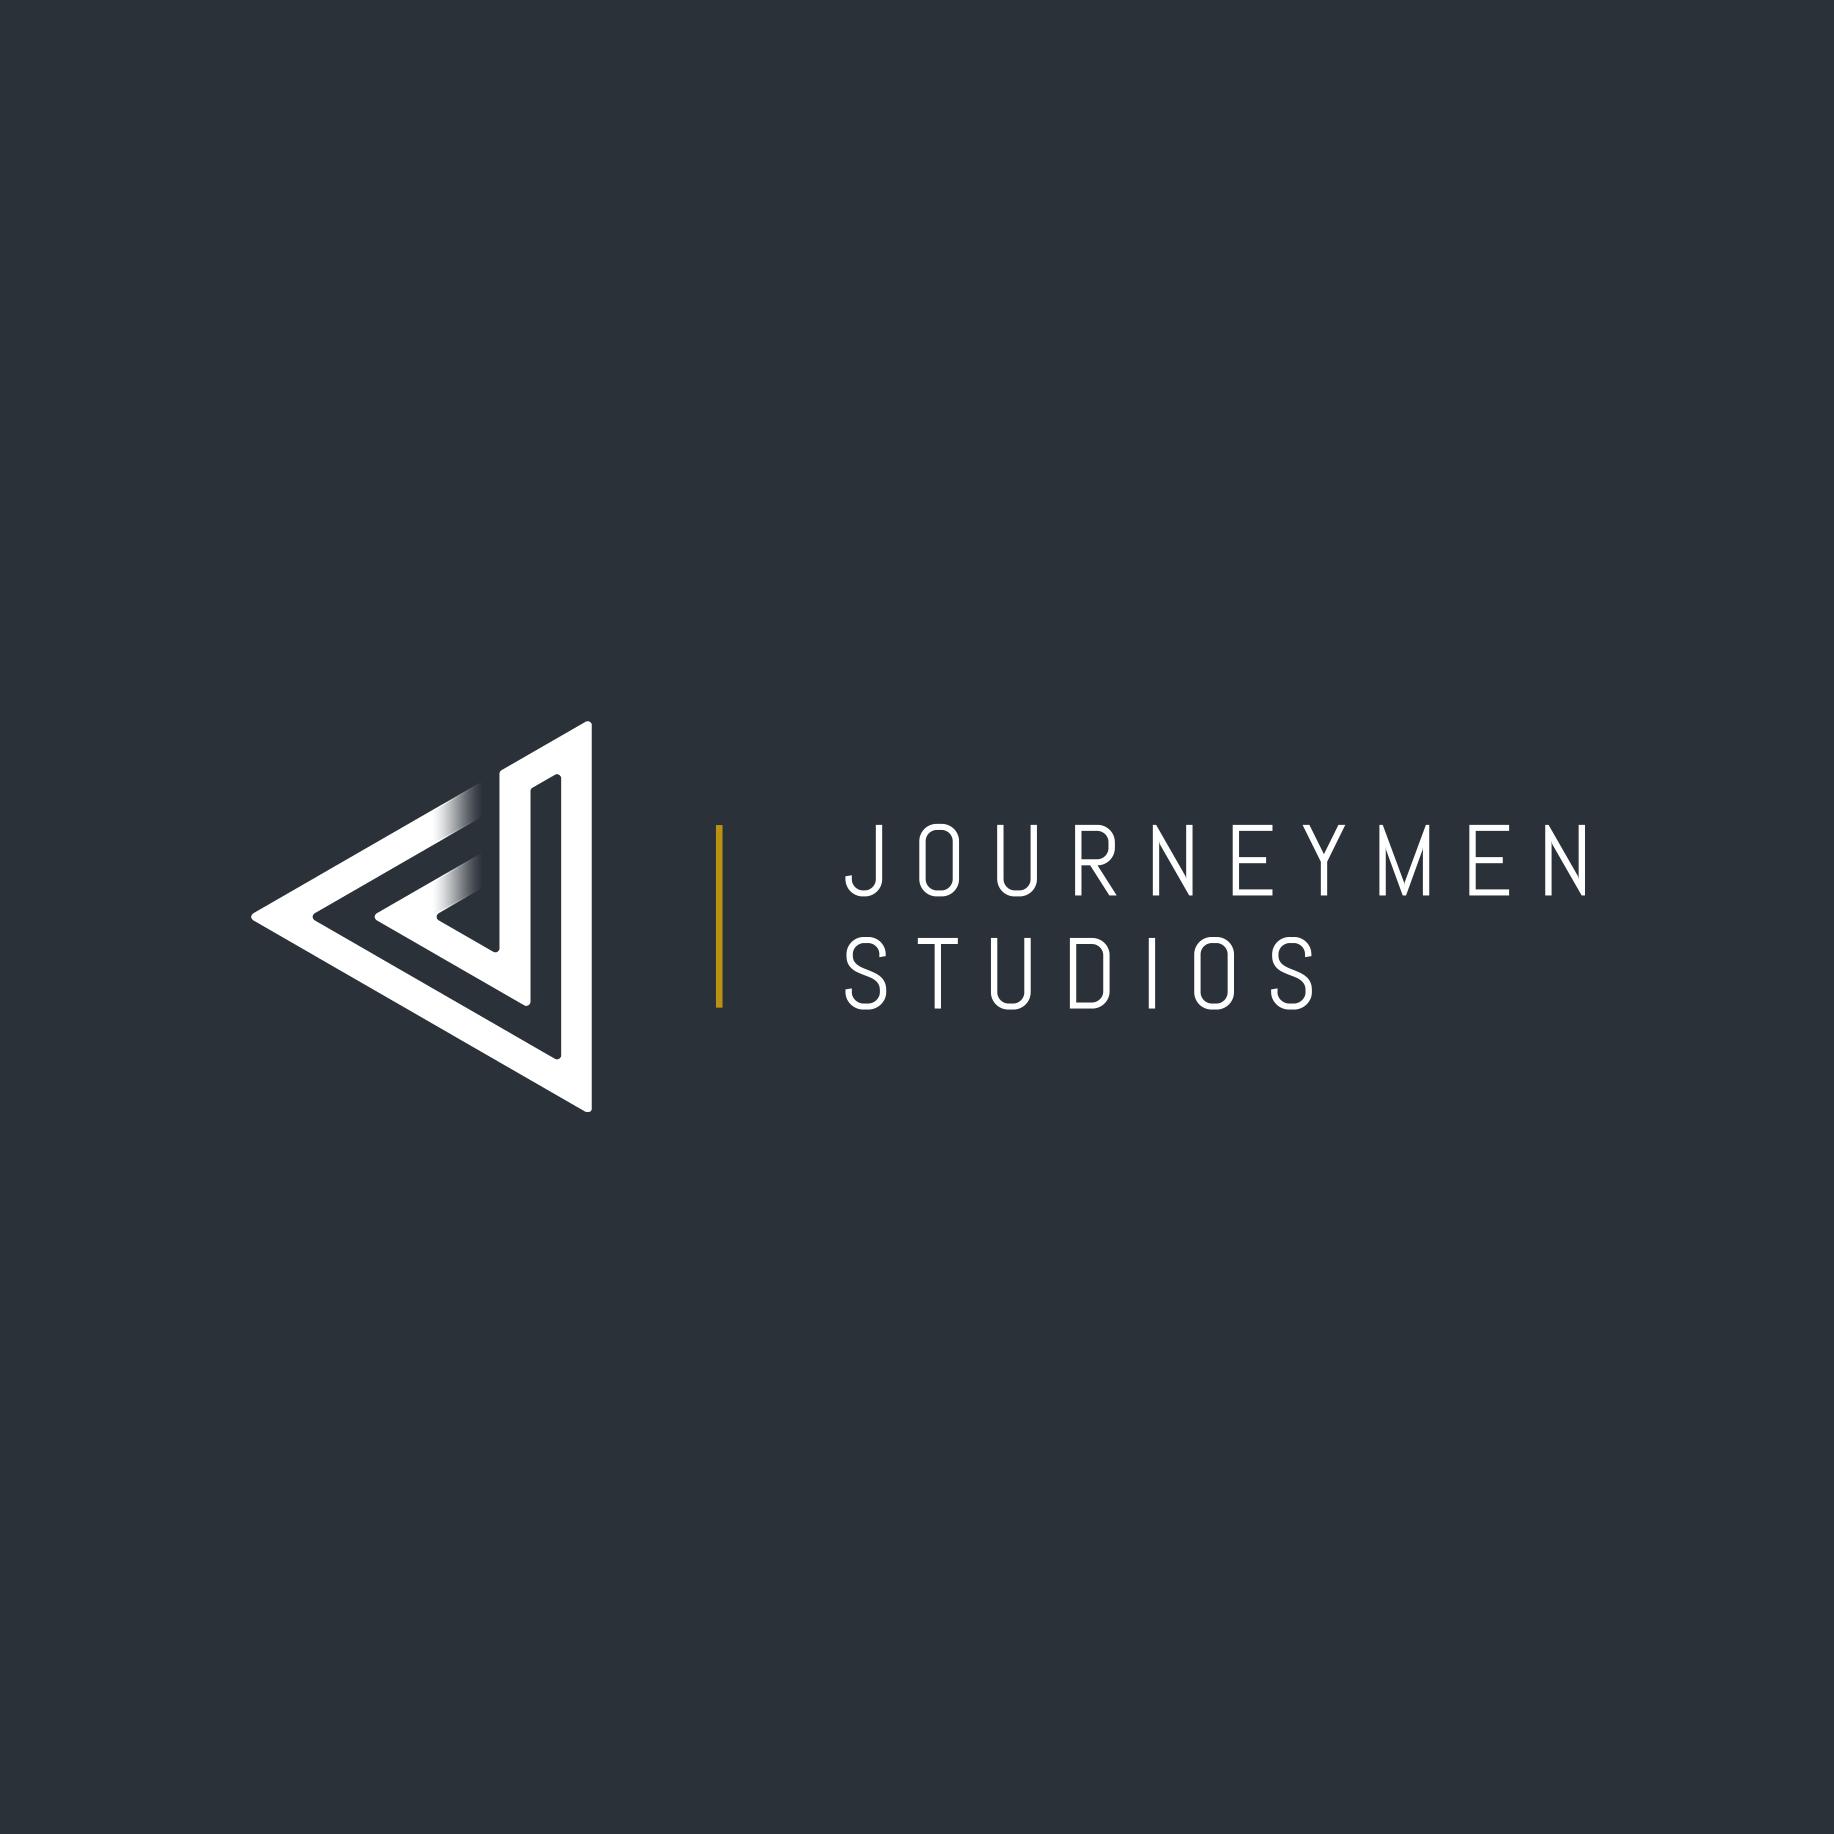 Journeymen Studios Logo